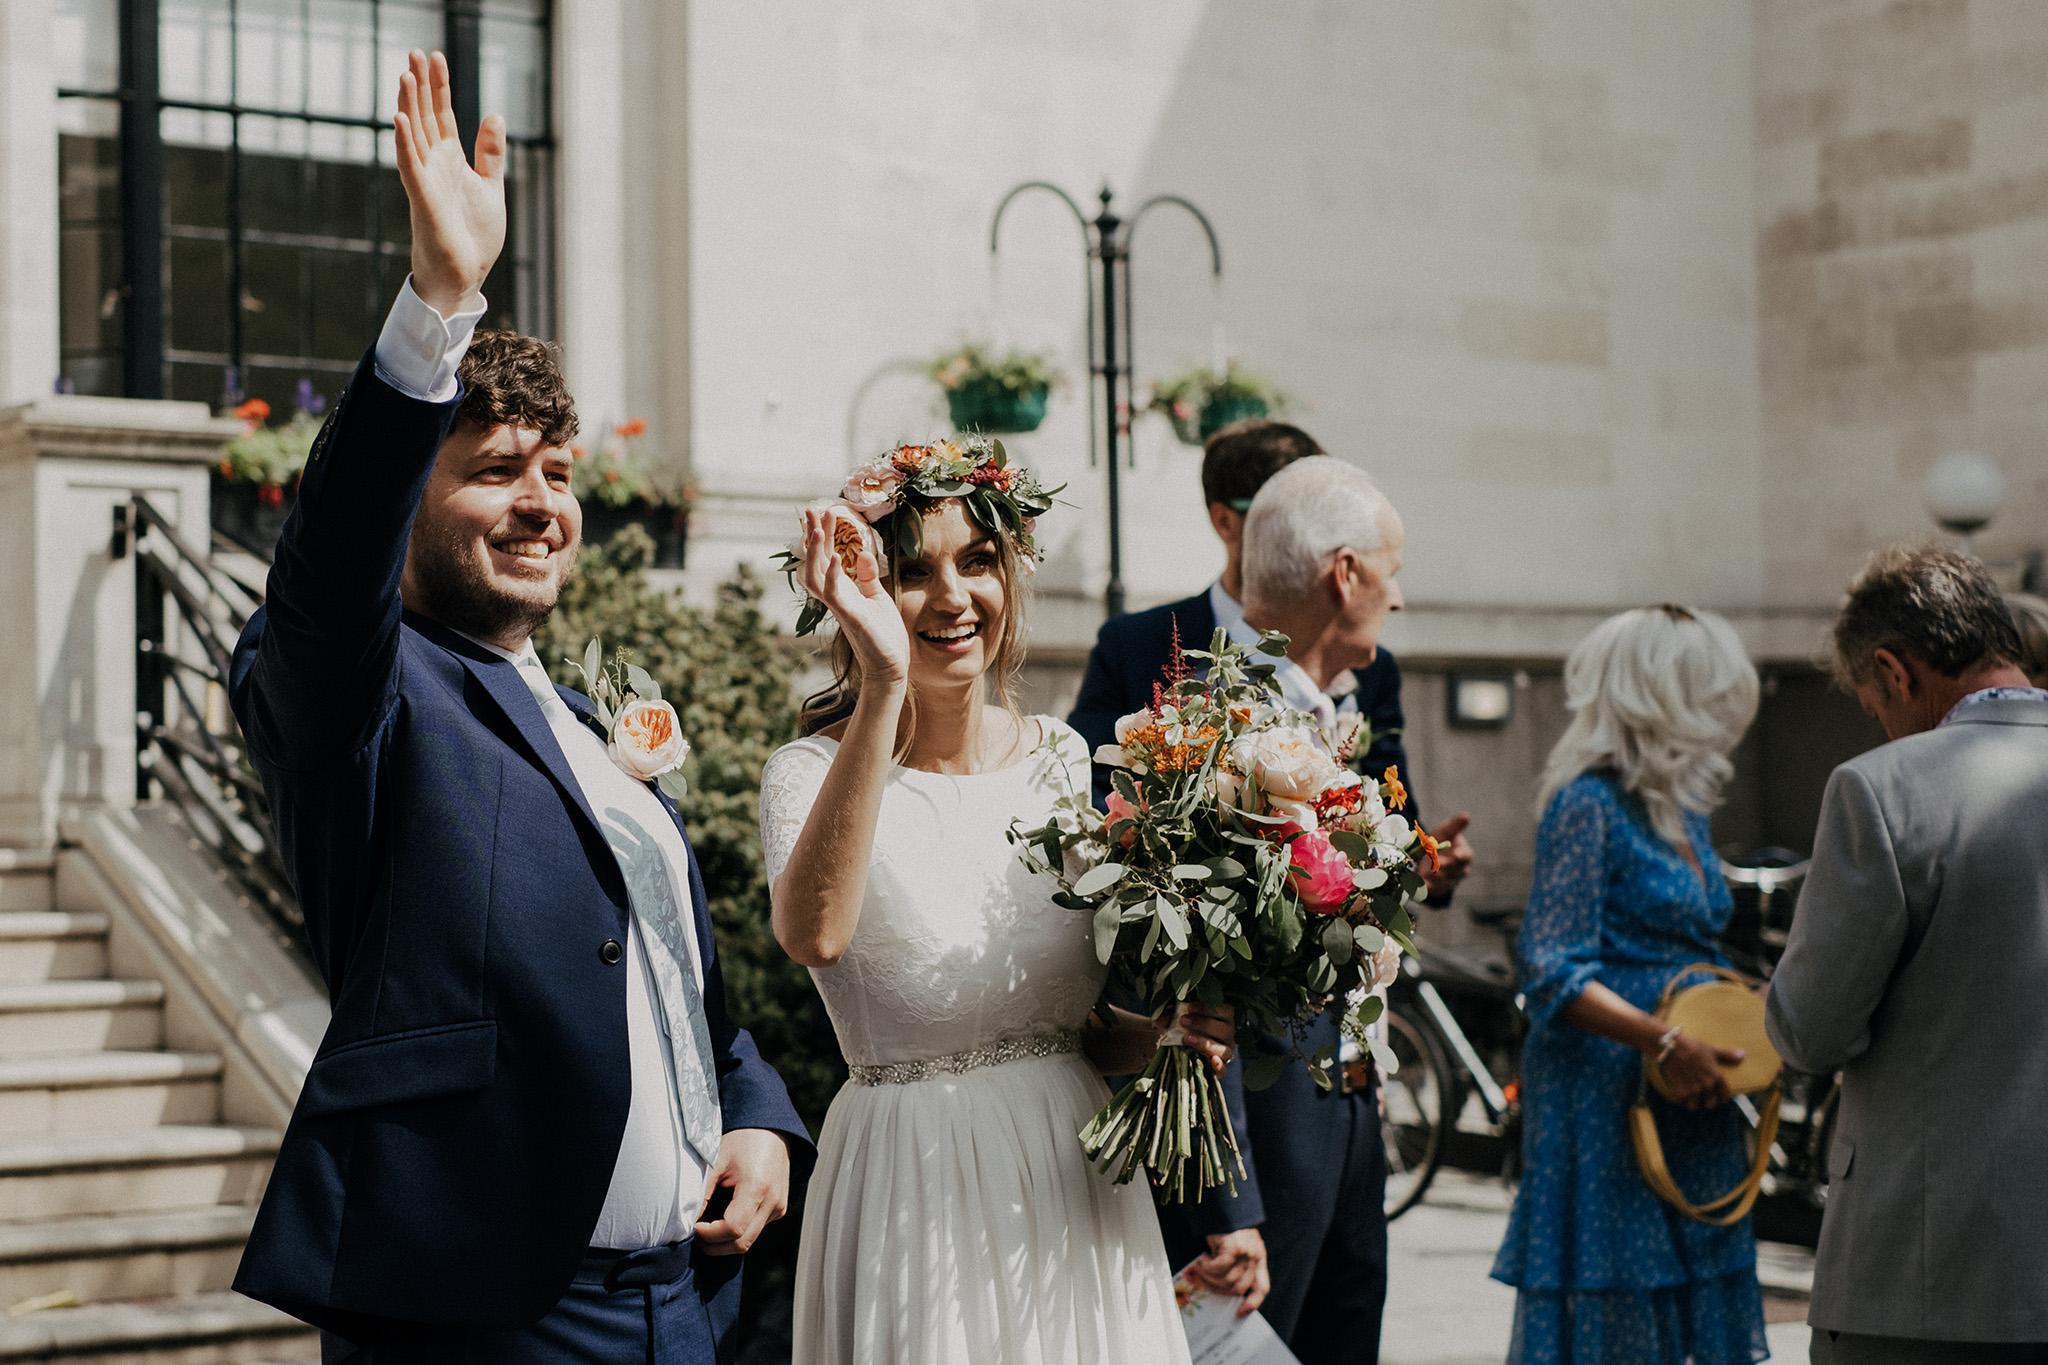 Islington-town-hall-wedding53.jpg